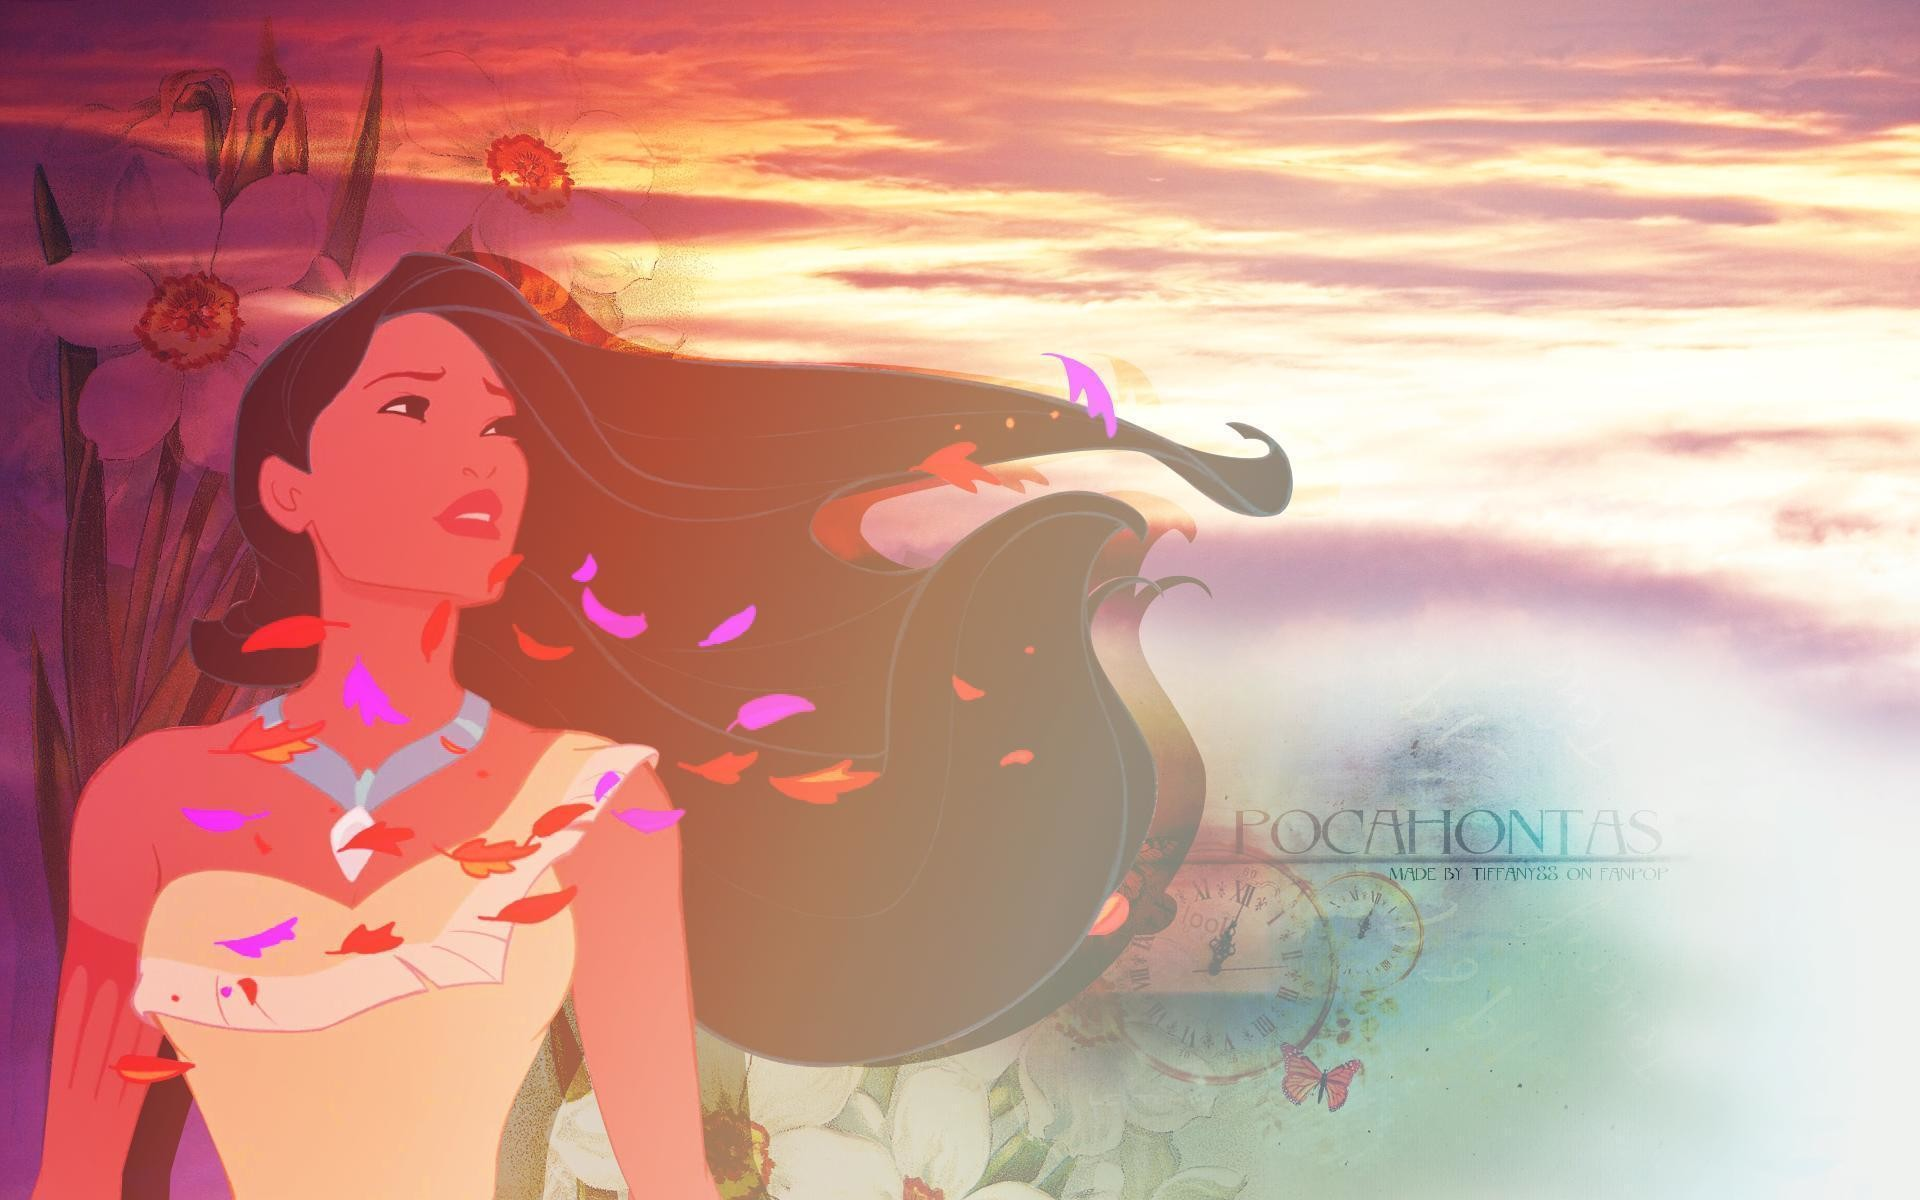 Res: 1920x1200, Pocahontas - Disney Princess Wallpaper (34405906) - Fanpop